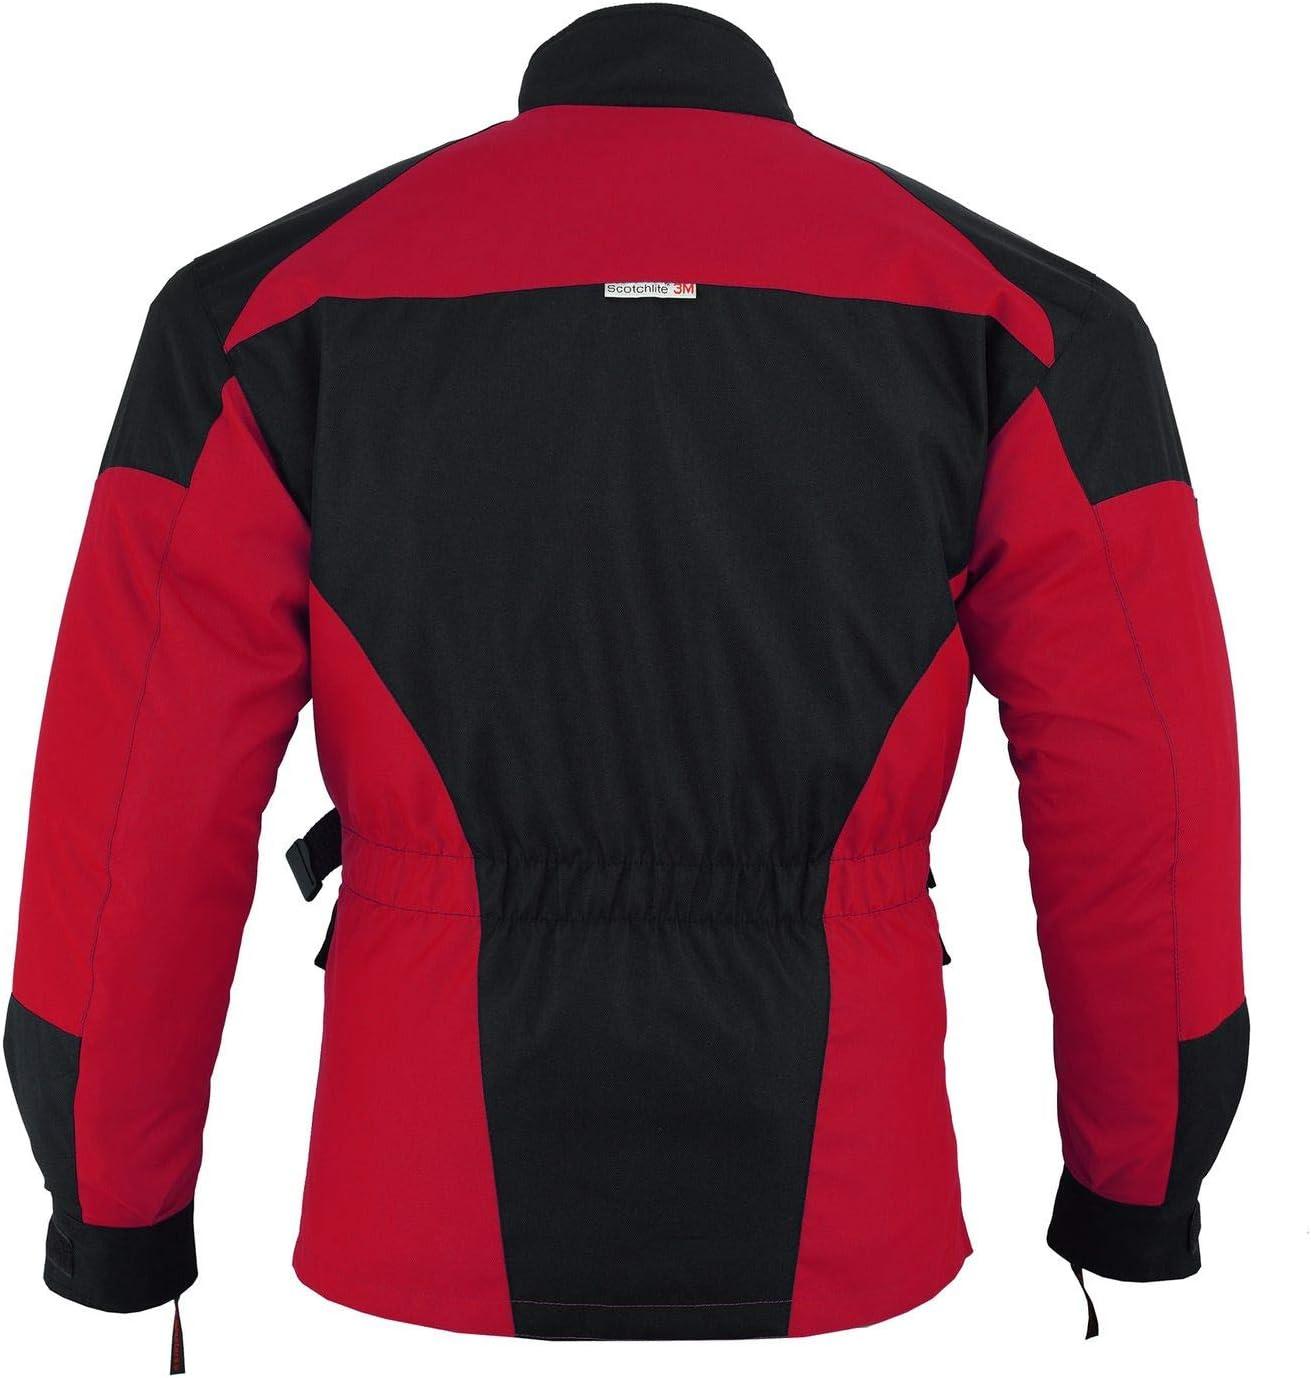 54//XL German Wear 2-teiler Motorradkombi Cordura Textilien Motorradjacke Rot//Schwarz Motorradhose